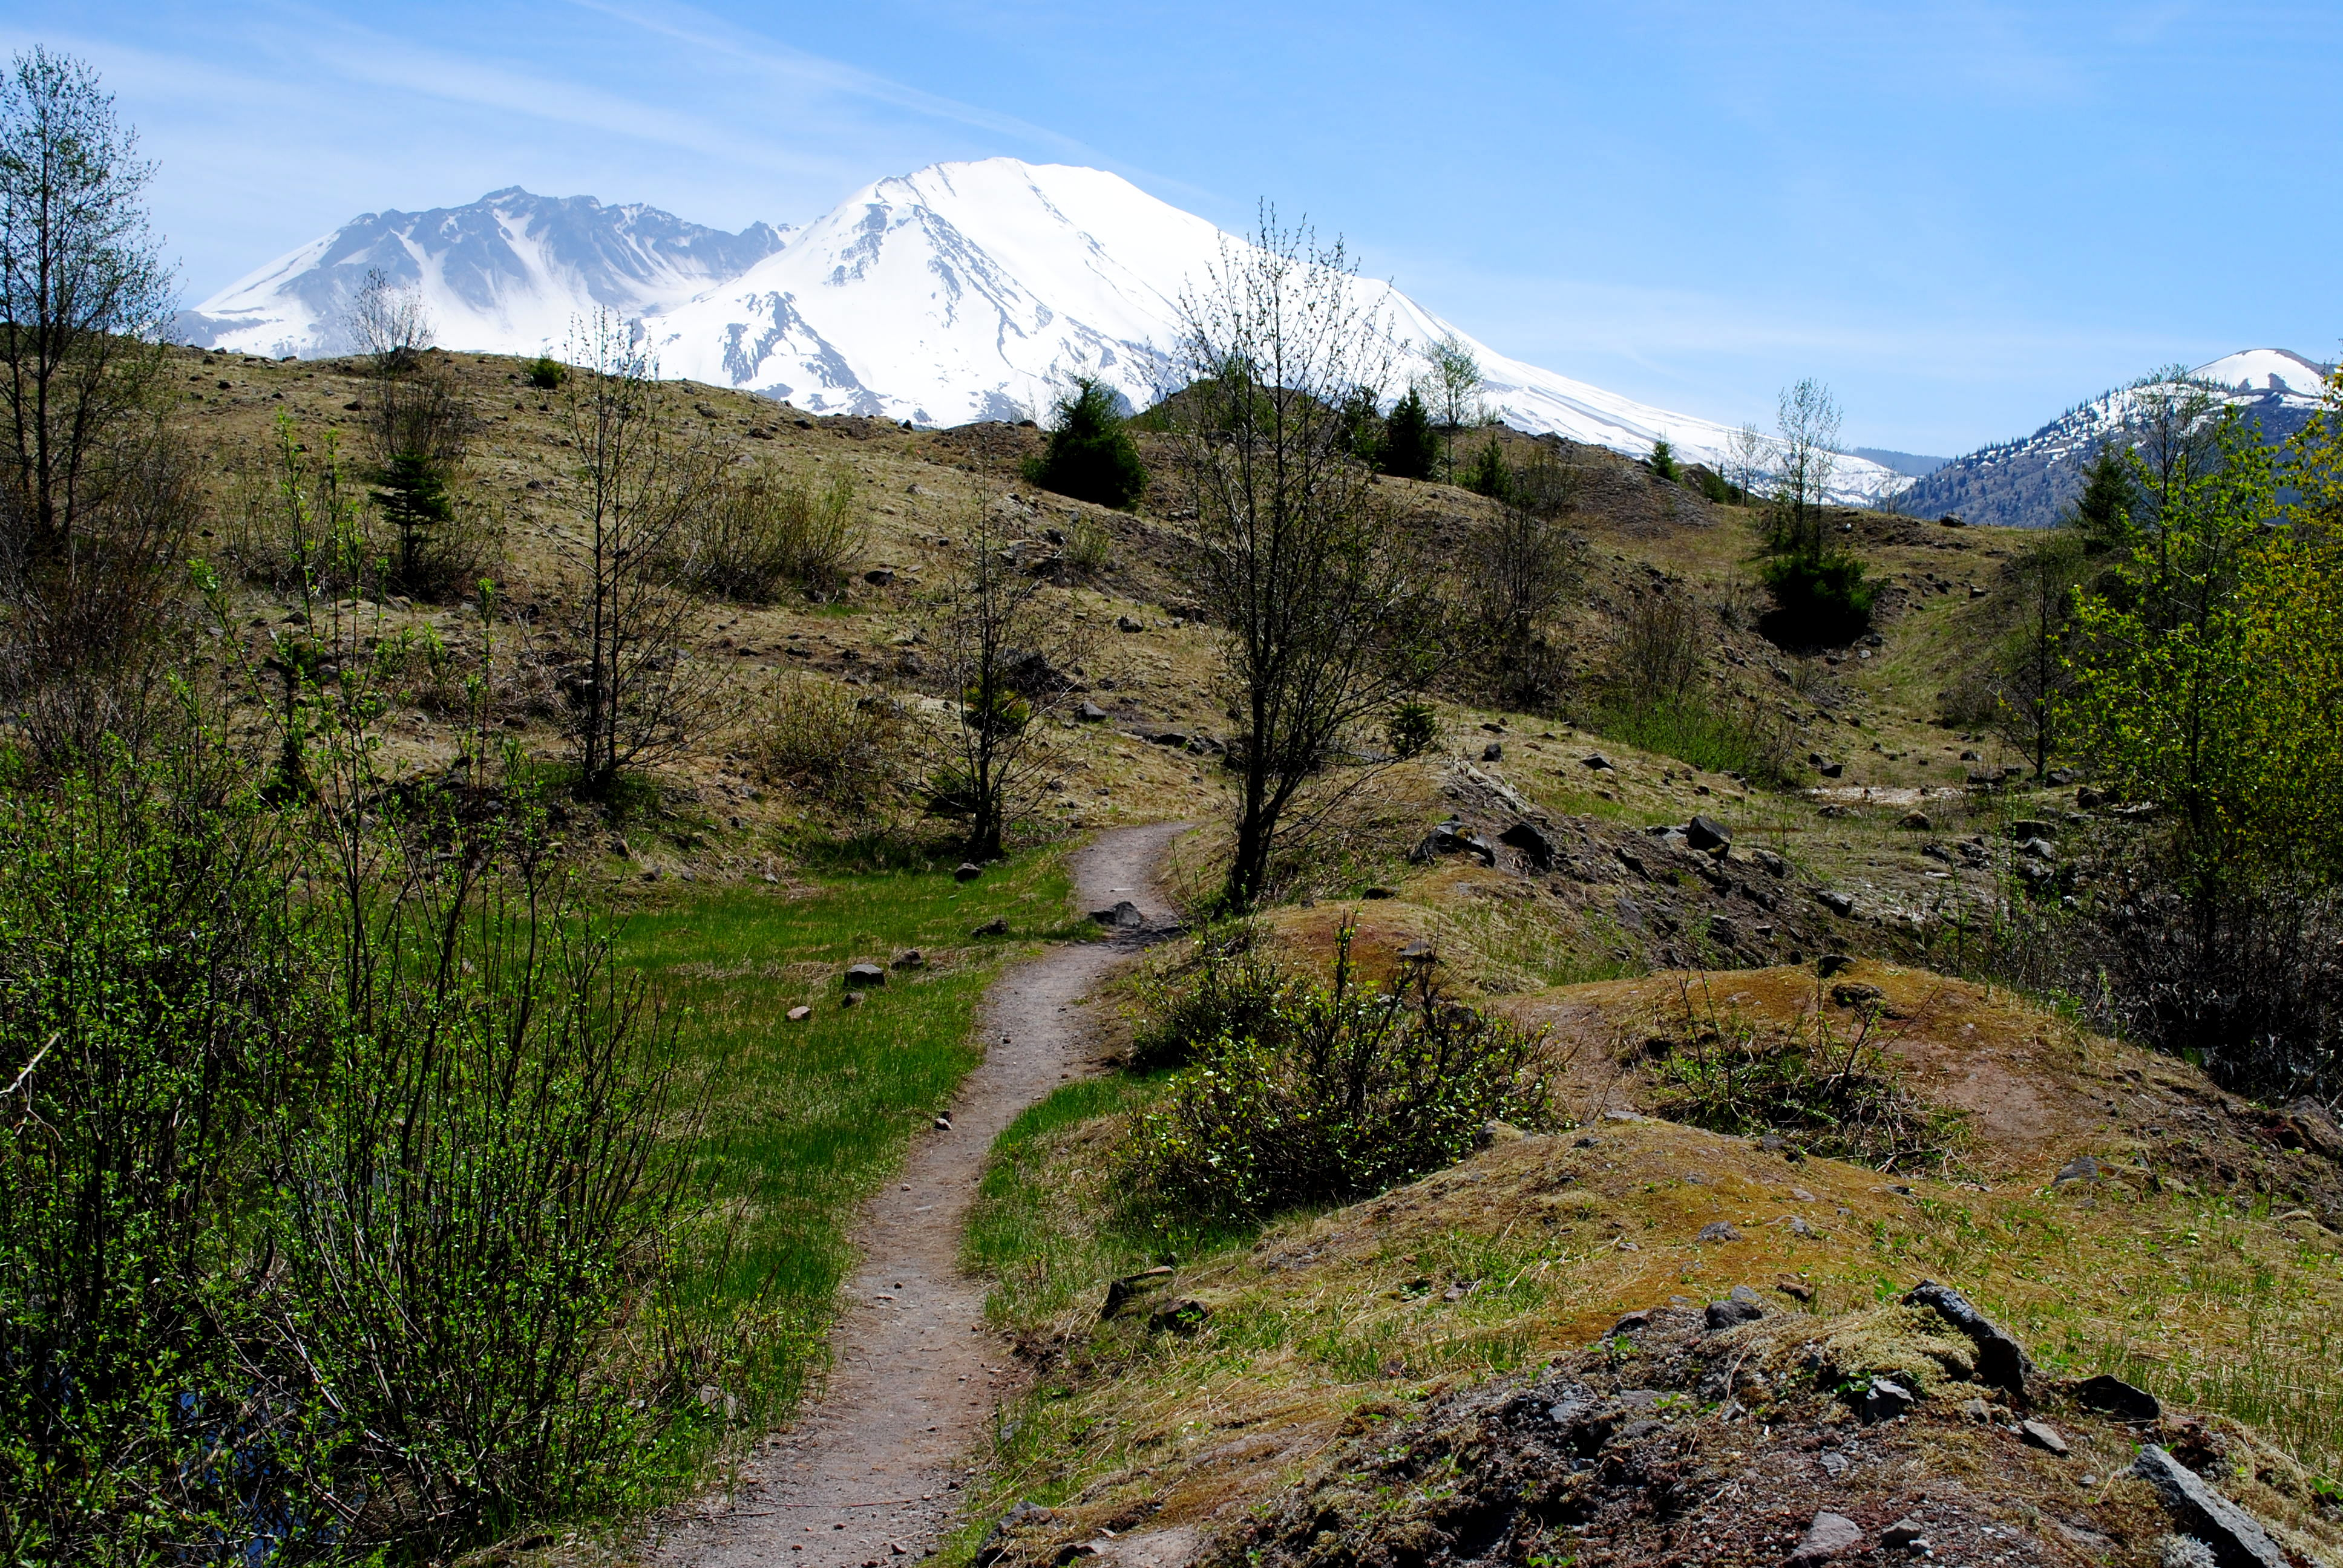 11976-hummocks-trail-flickr-ethan-douglass